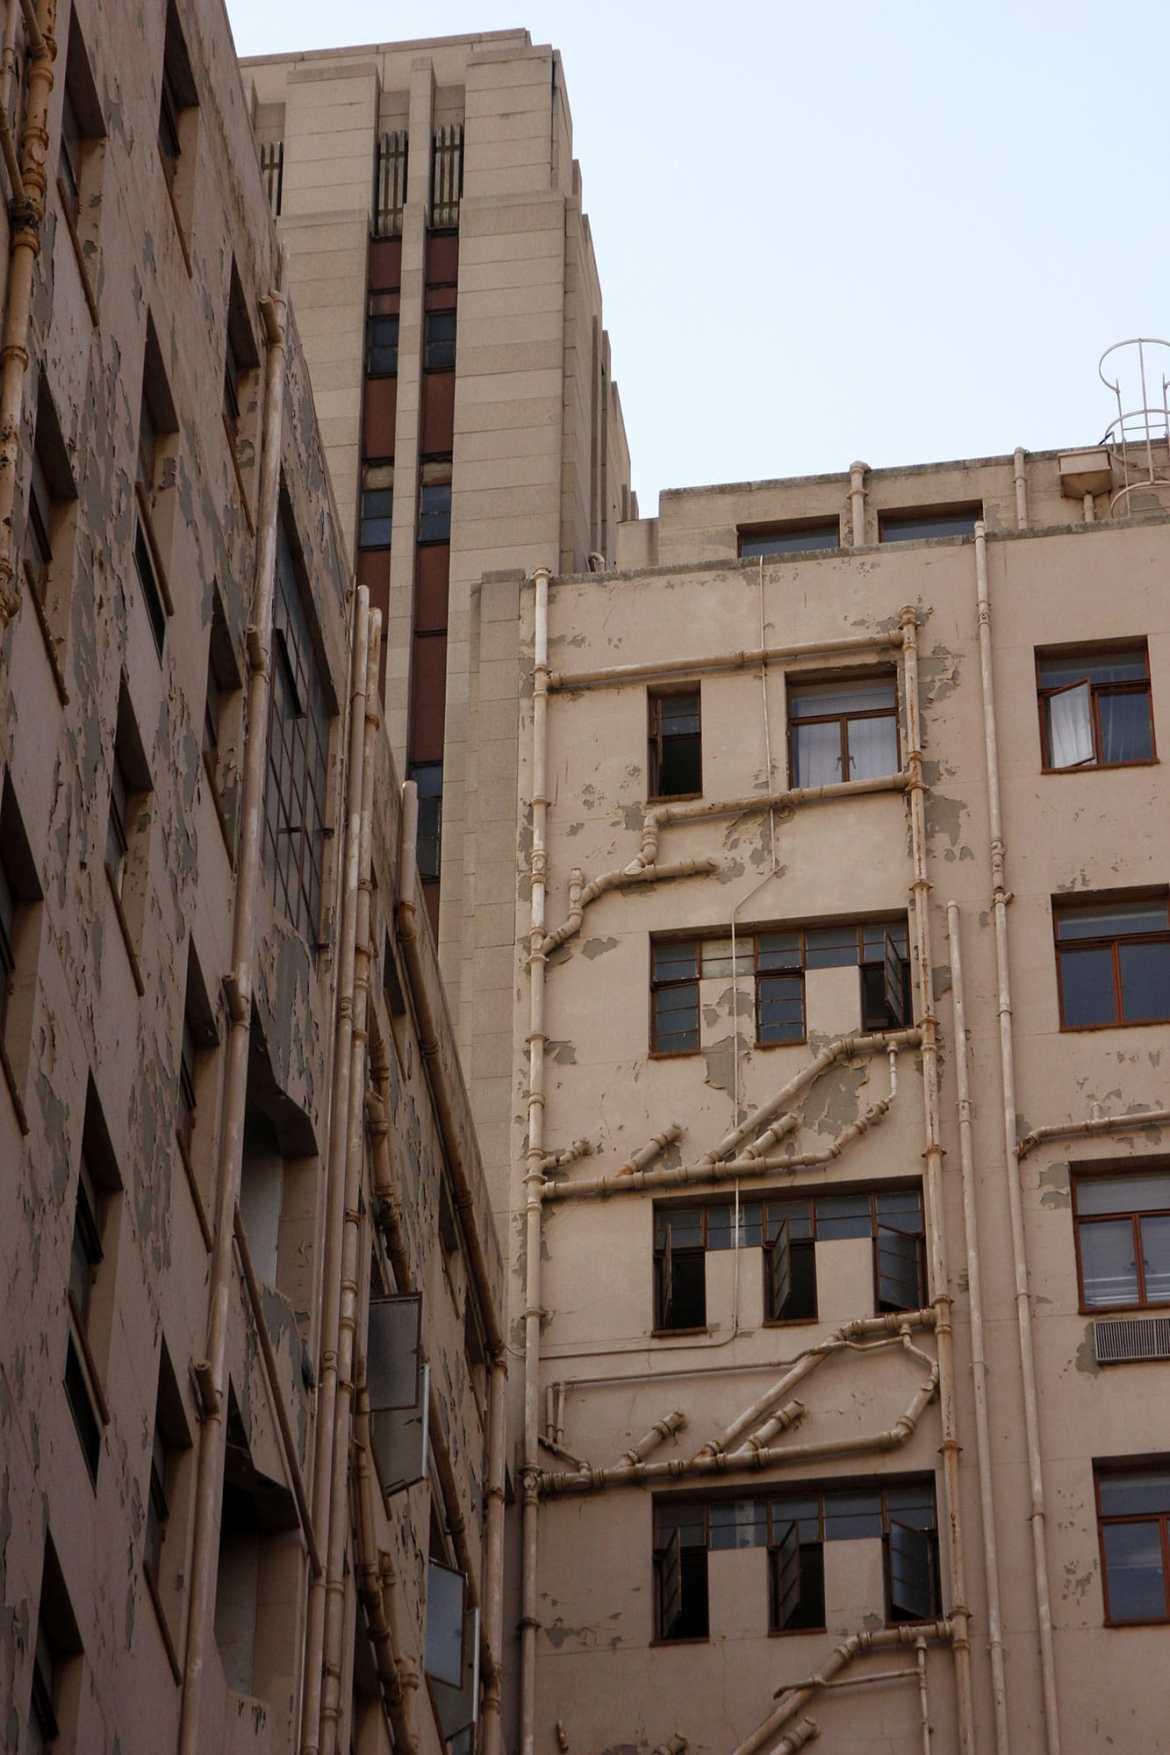 Kaputte Hausfront in Johannesburg